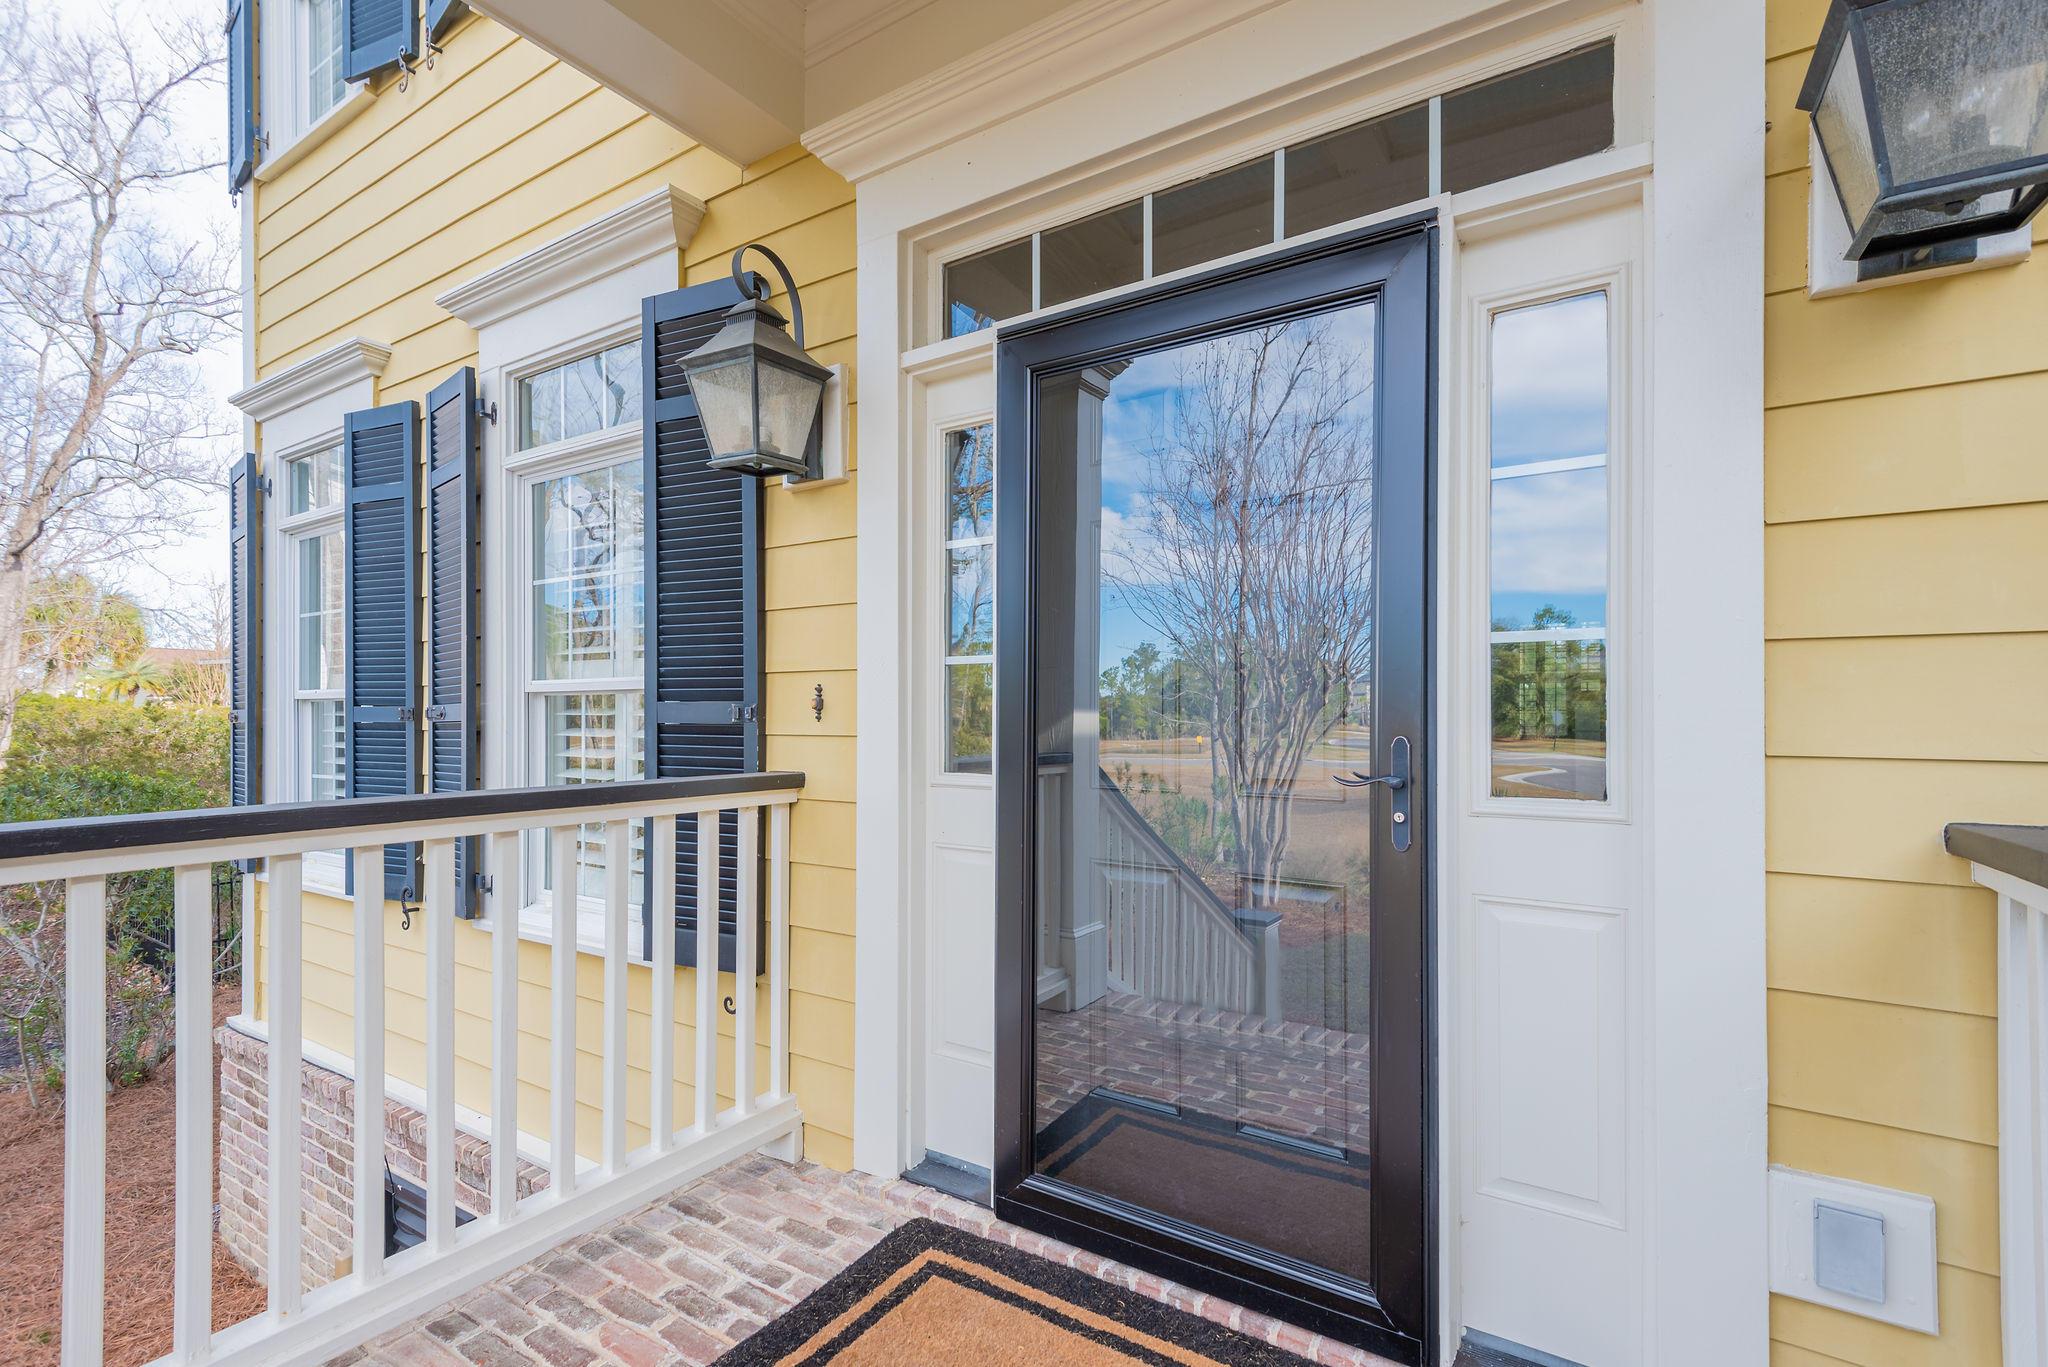 Dunes West Homes For Sale - 1305 King Bird, Mount Pleasant, SC - 41